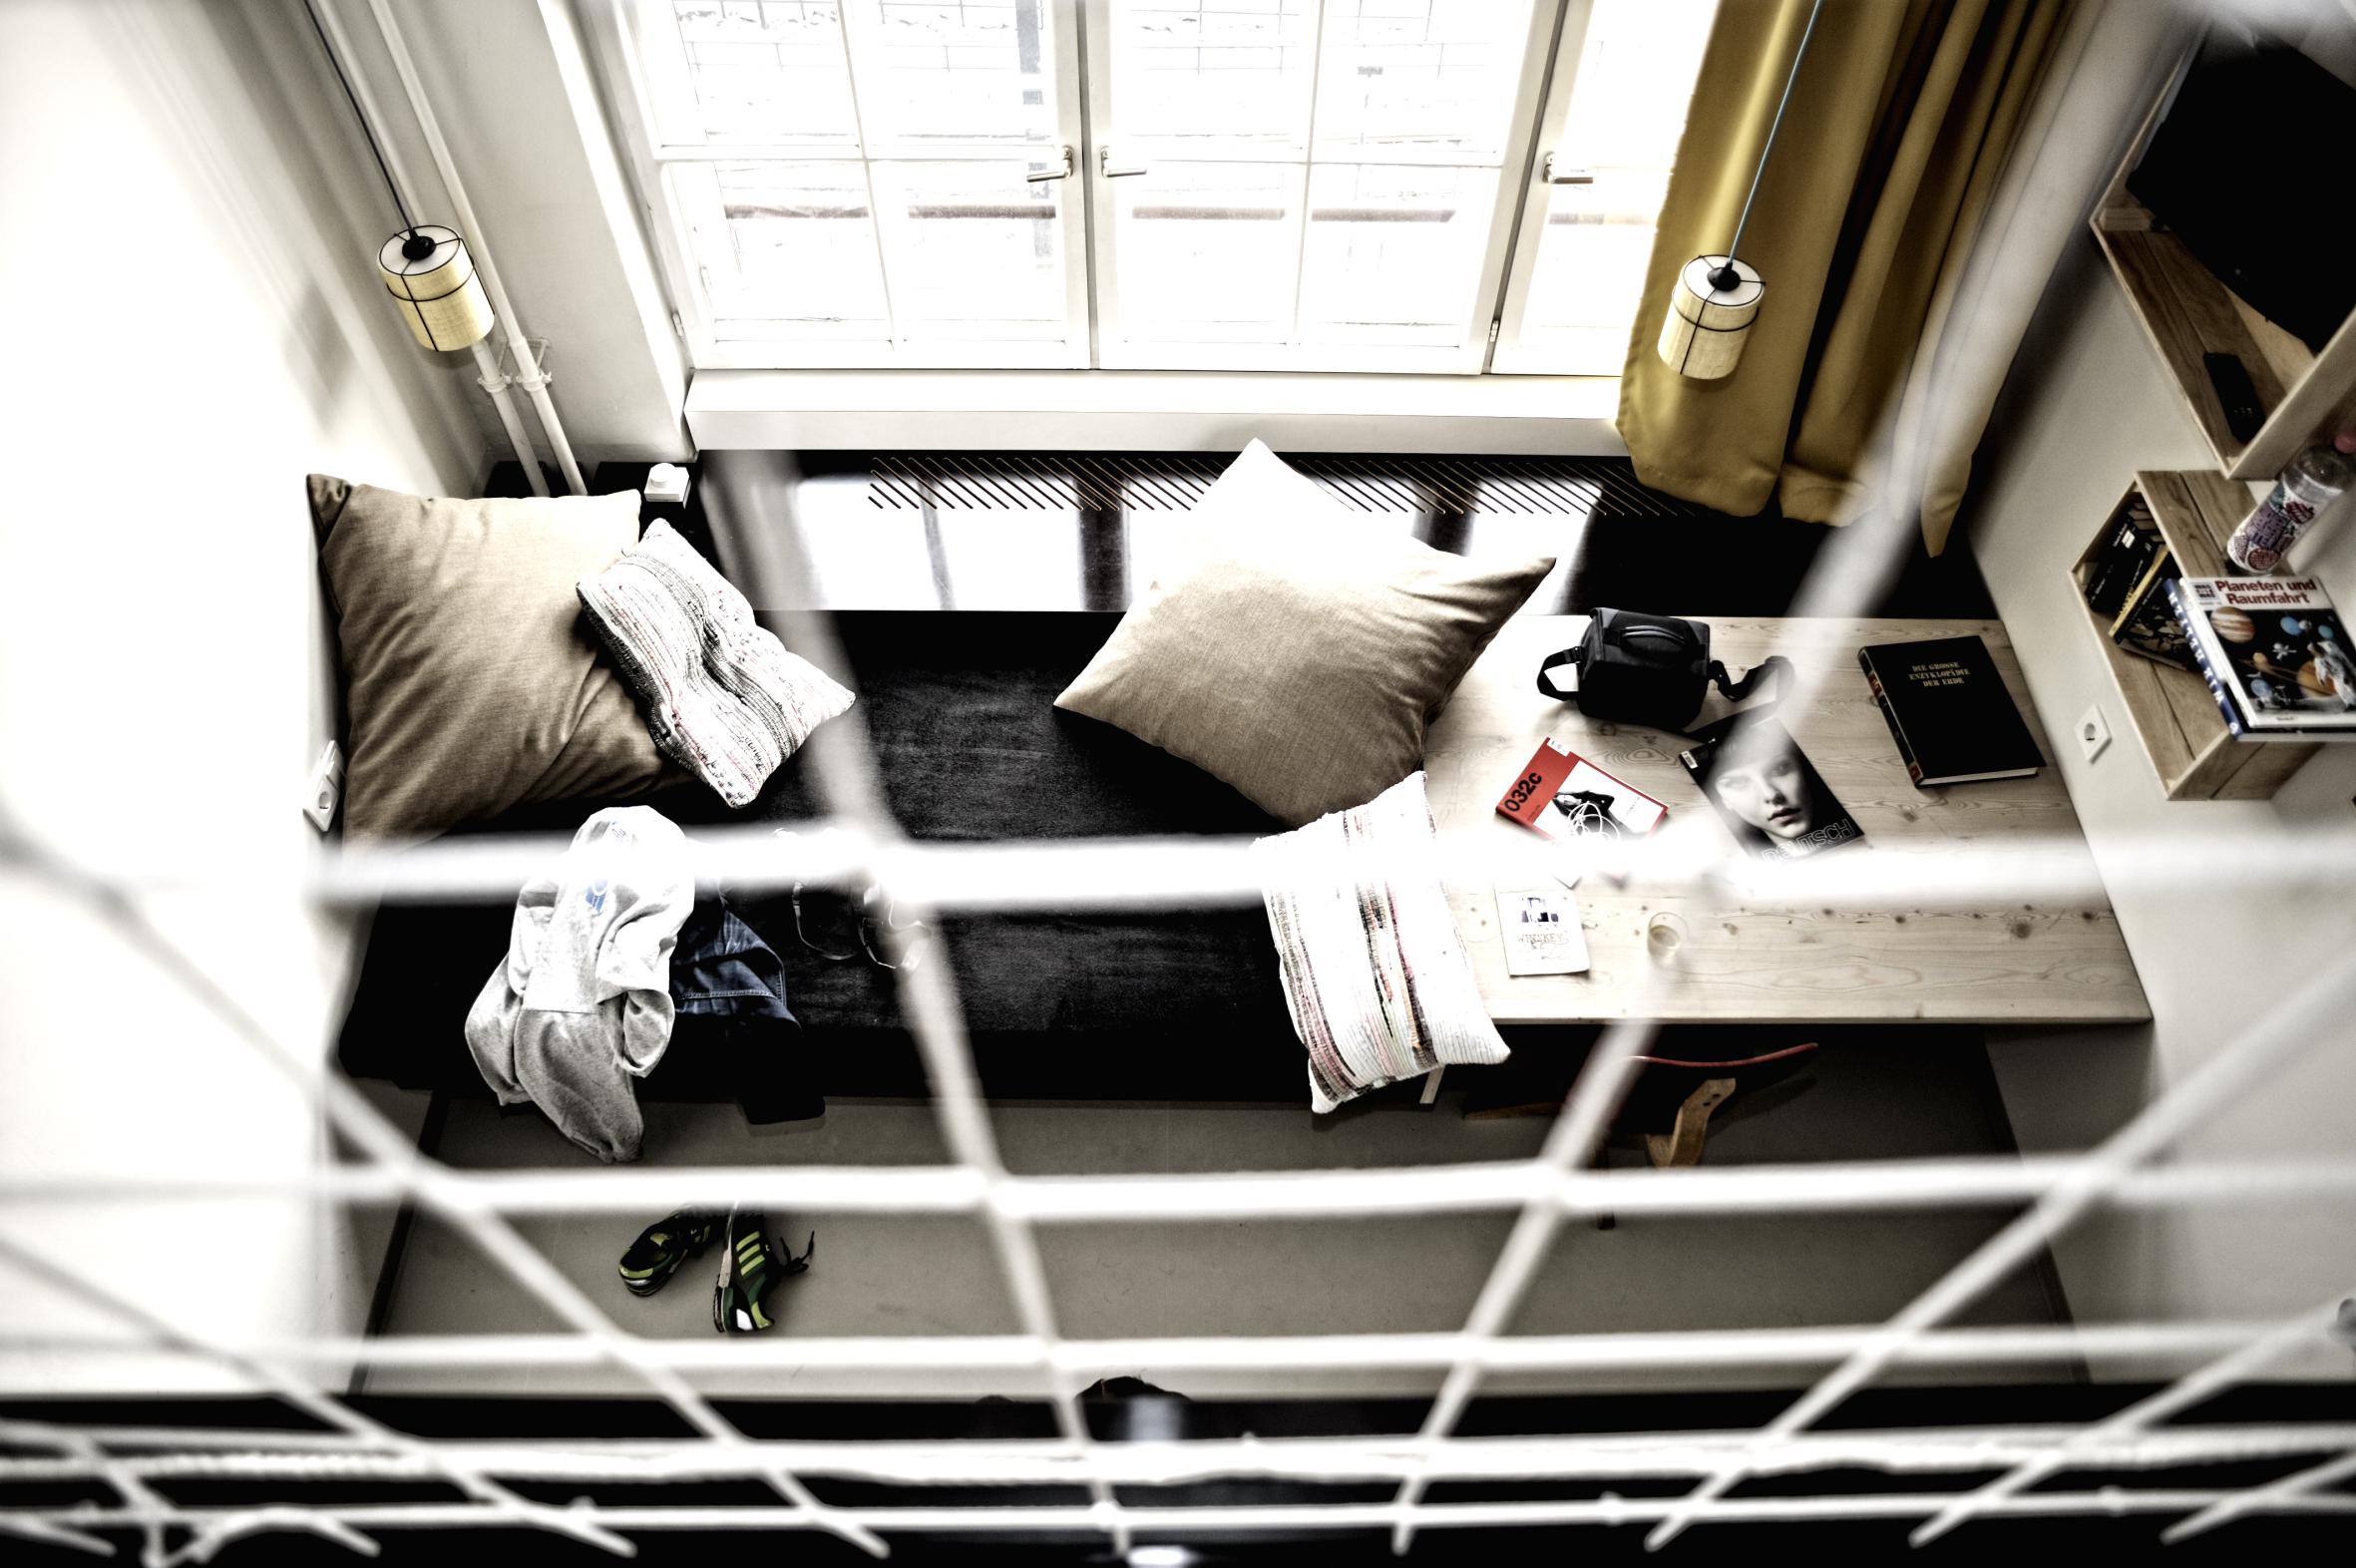 Michelberger Hotel - Berlin // © Michelberger Hotel